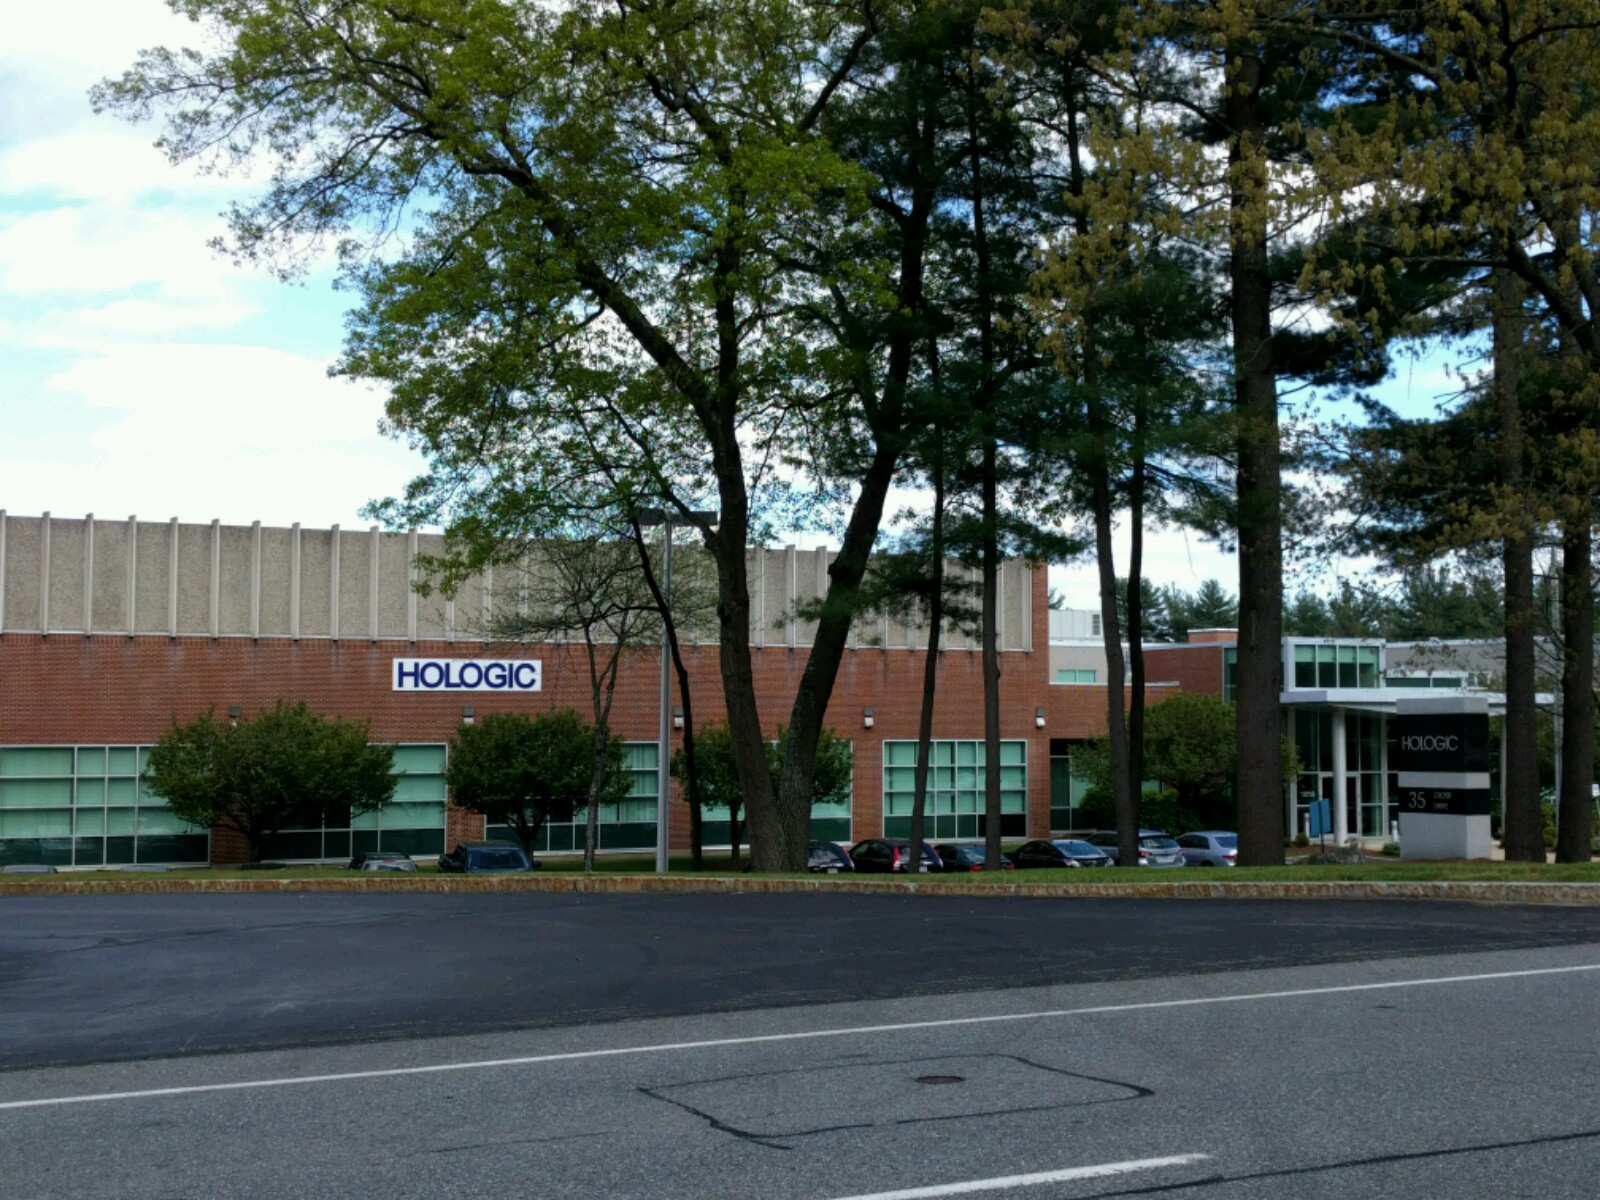 Hologic's corporate headquarters in Marlborough, Massachusetts.